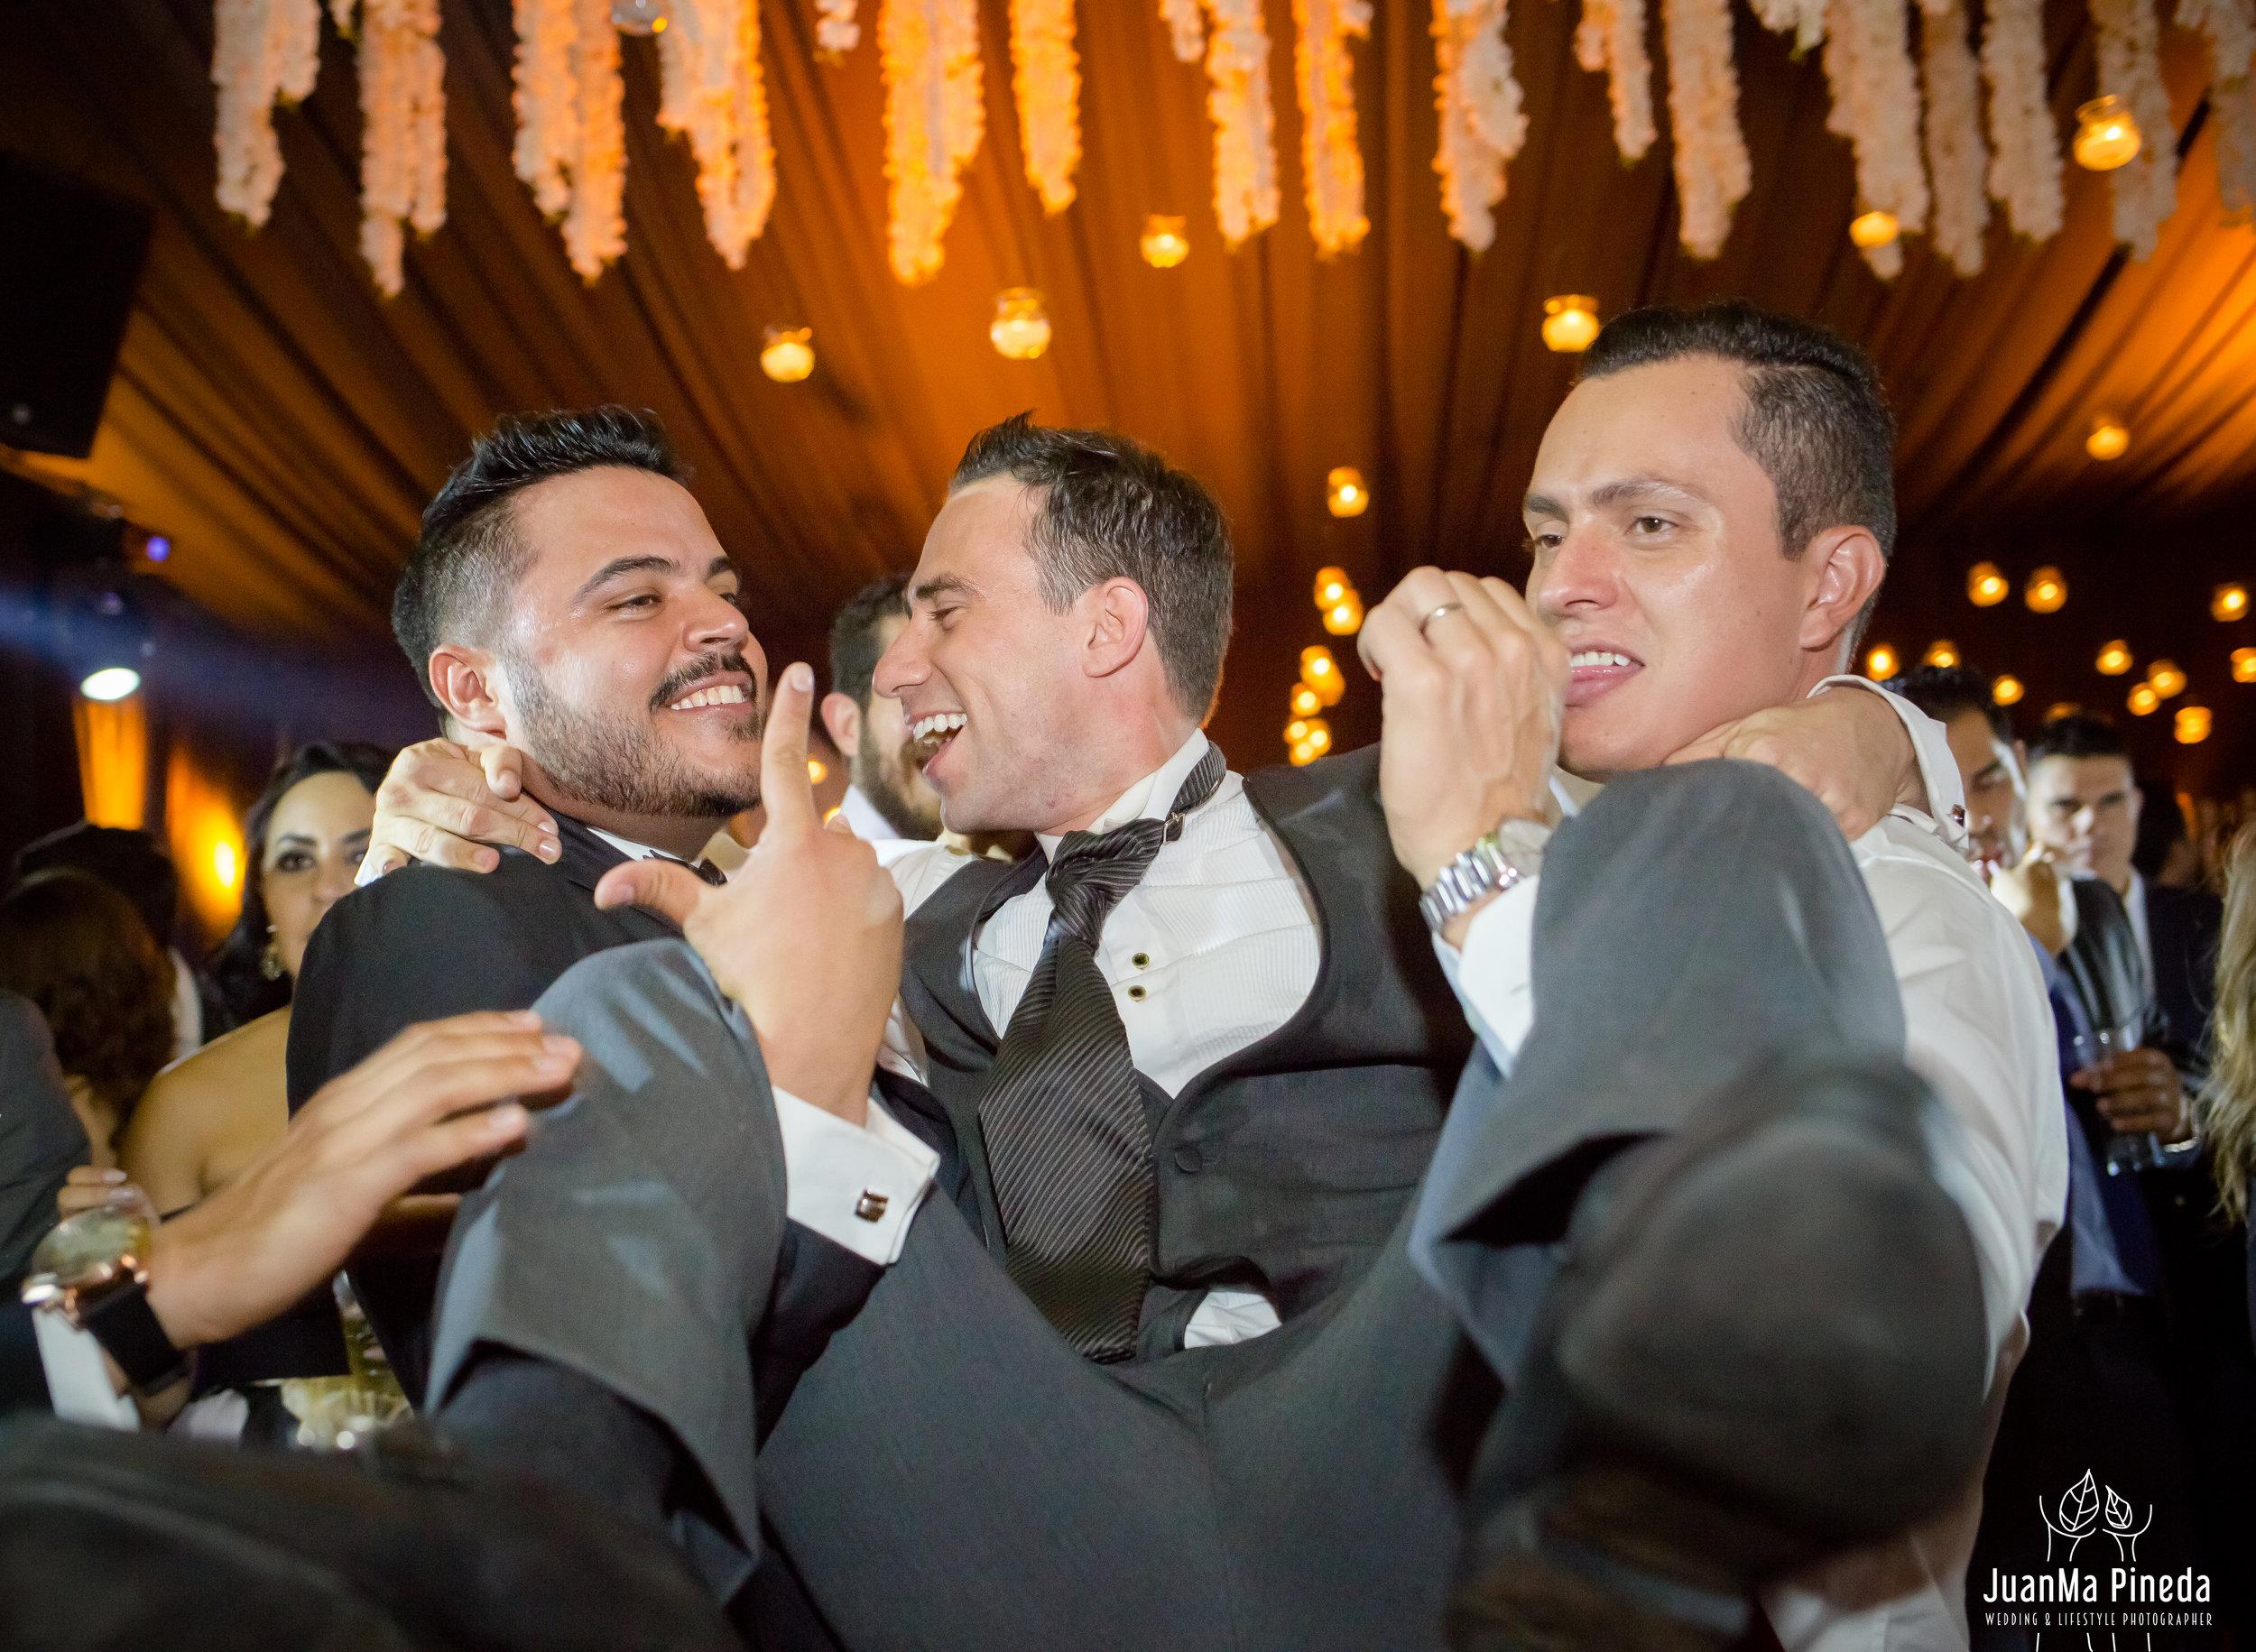 Wedding+Day+Photographer-1-6.jpg